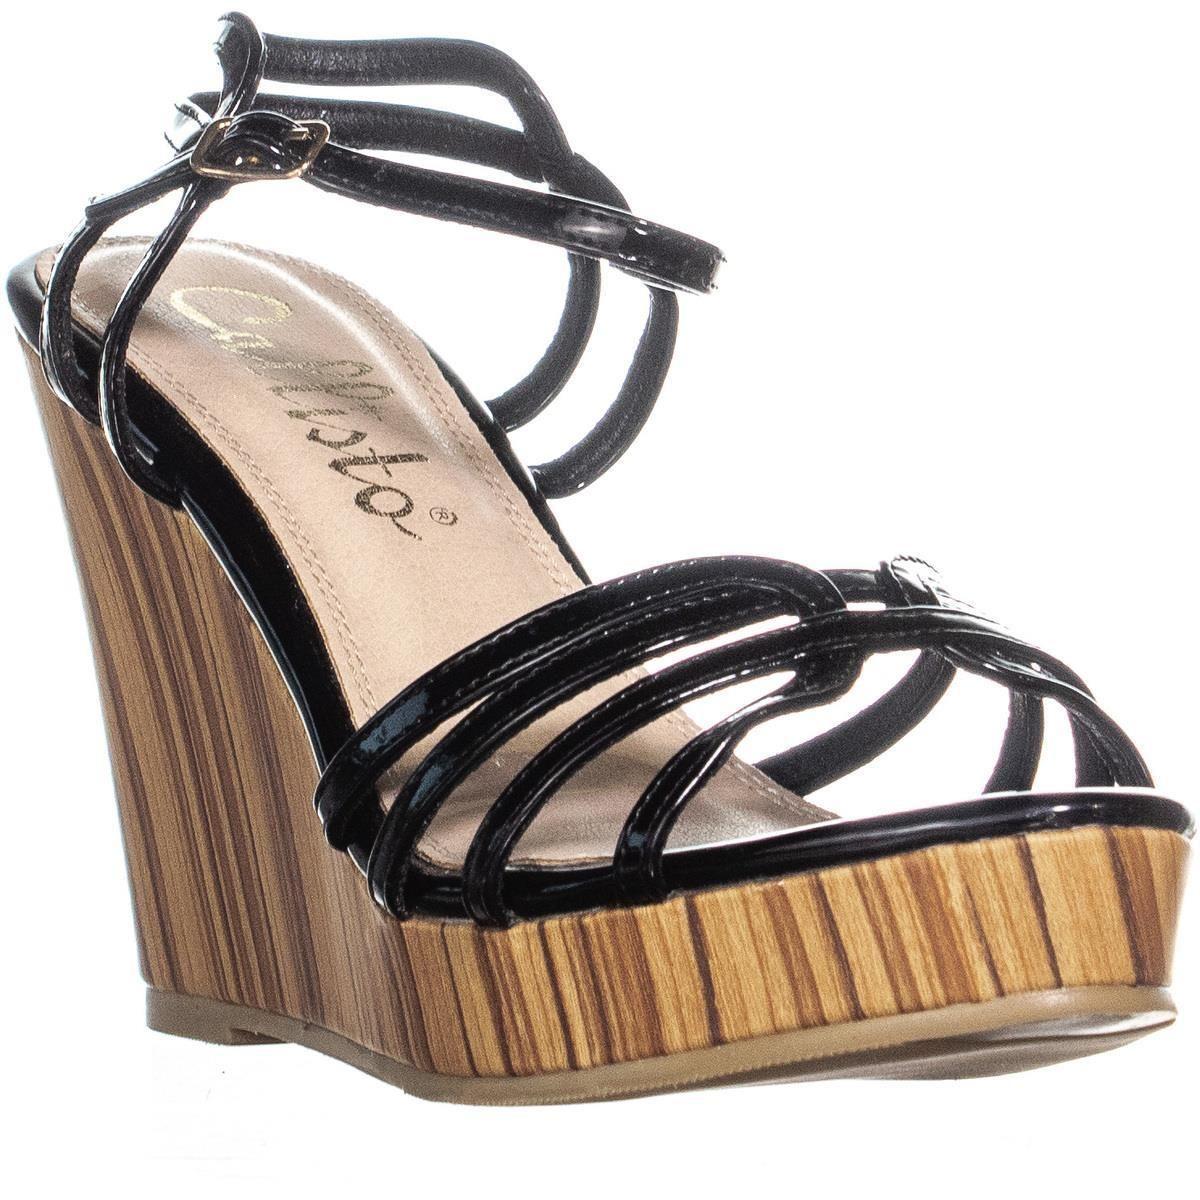 11bdc905fc3 Callisto - Black Brush Strappy Wedge Sandals - Lyst. View fullscreen